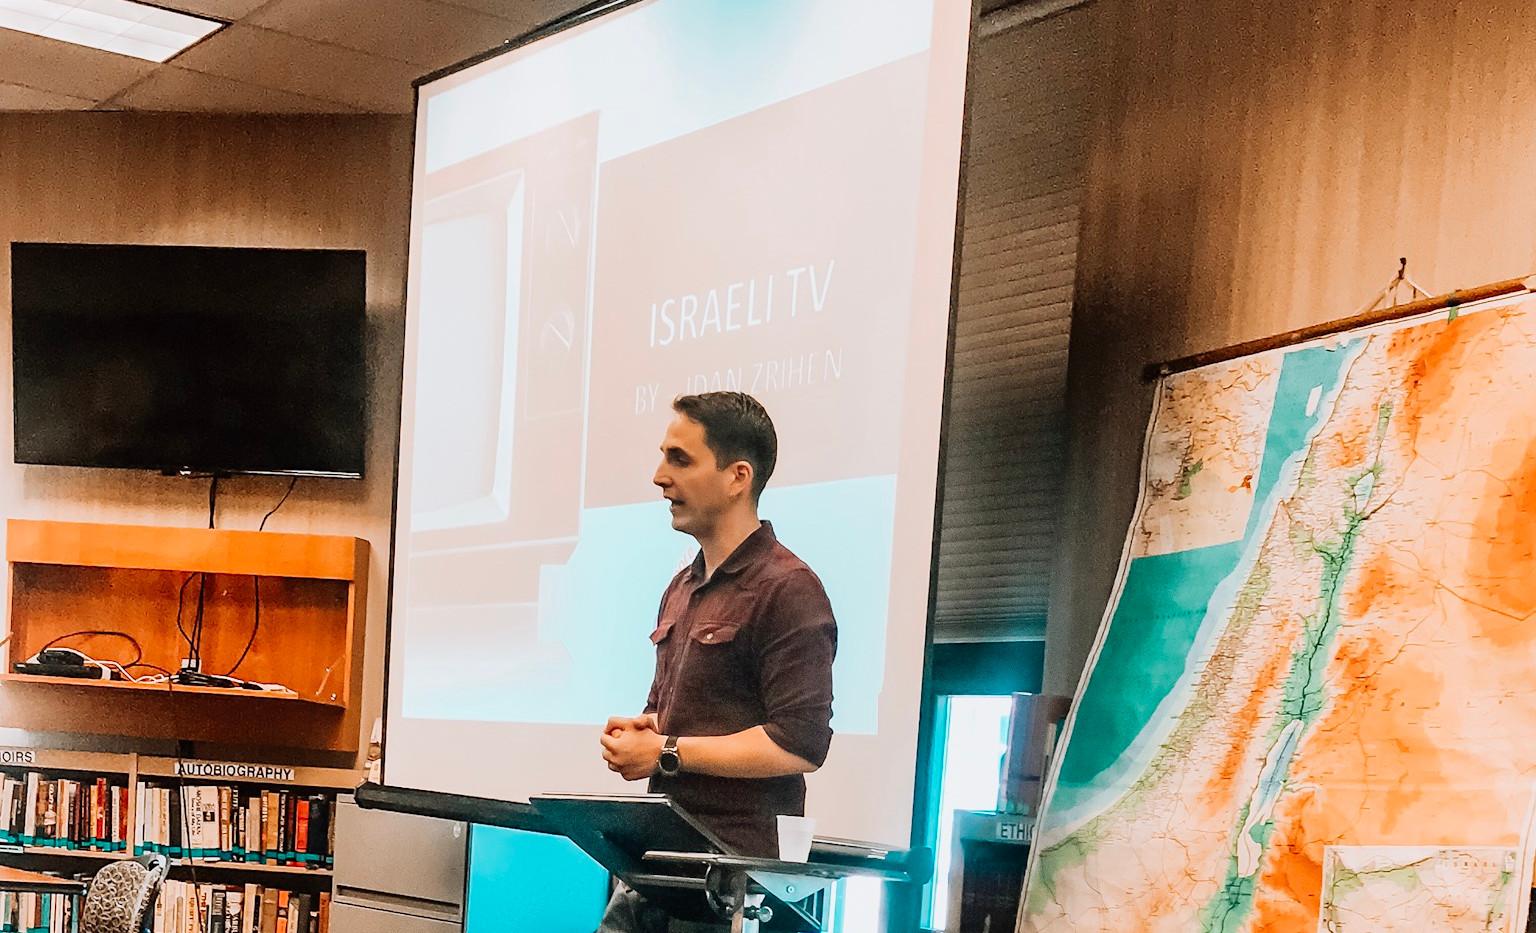 Idan talking about Israel's TV history at Beth El Congregation